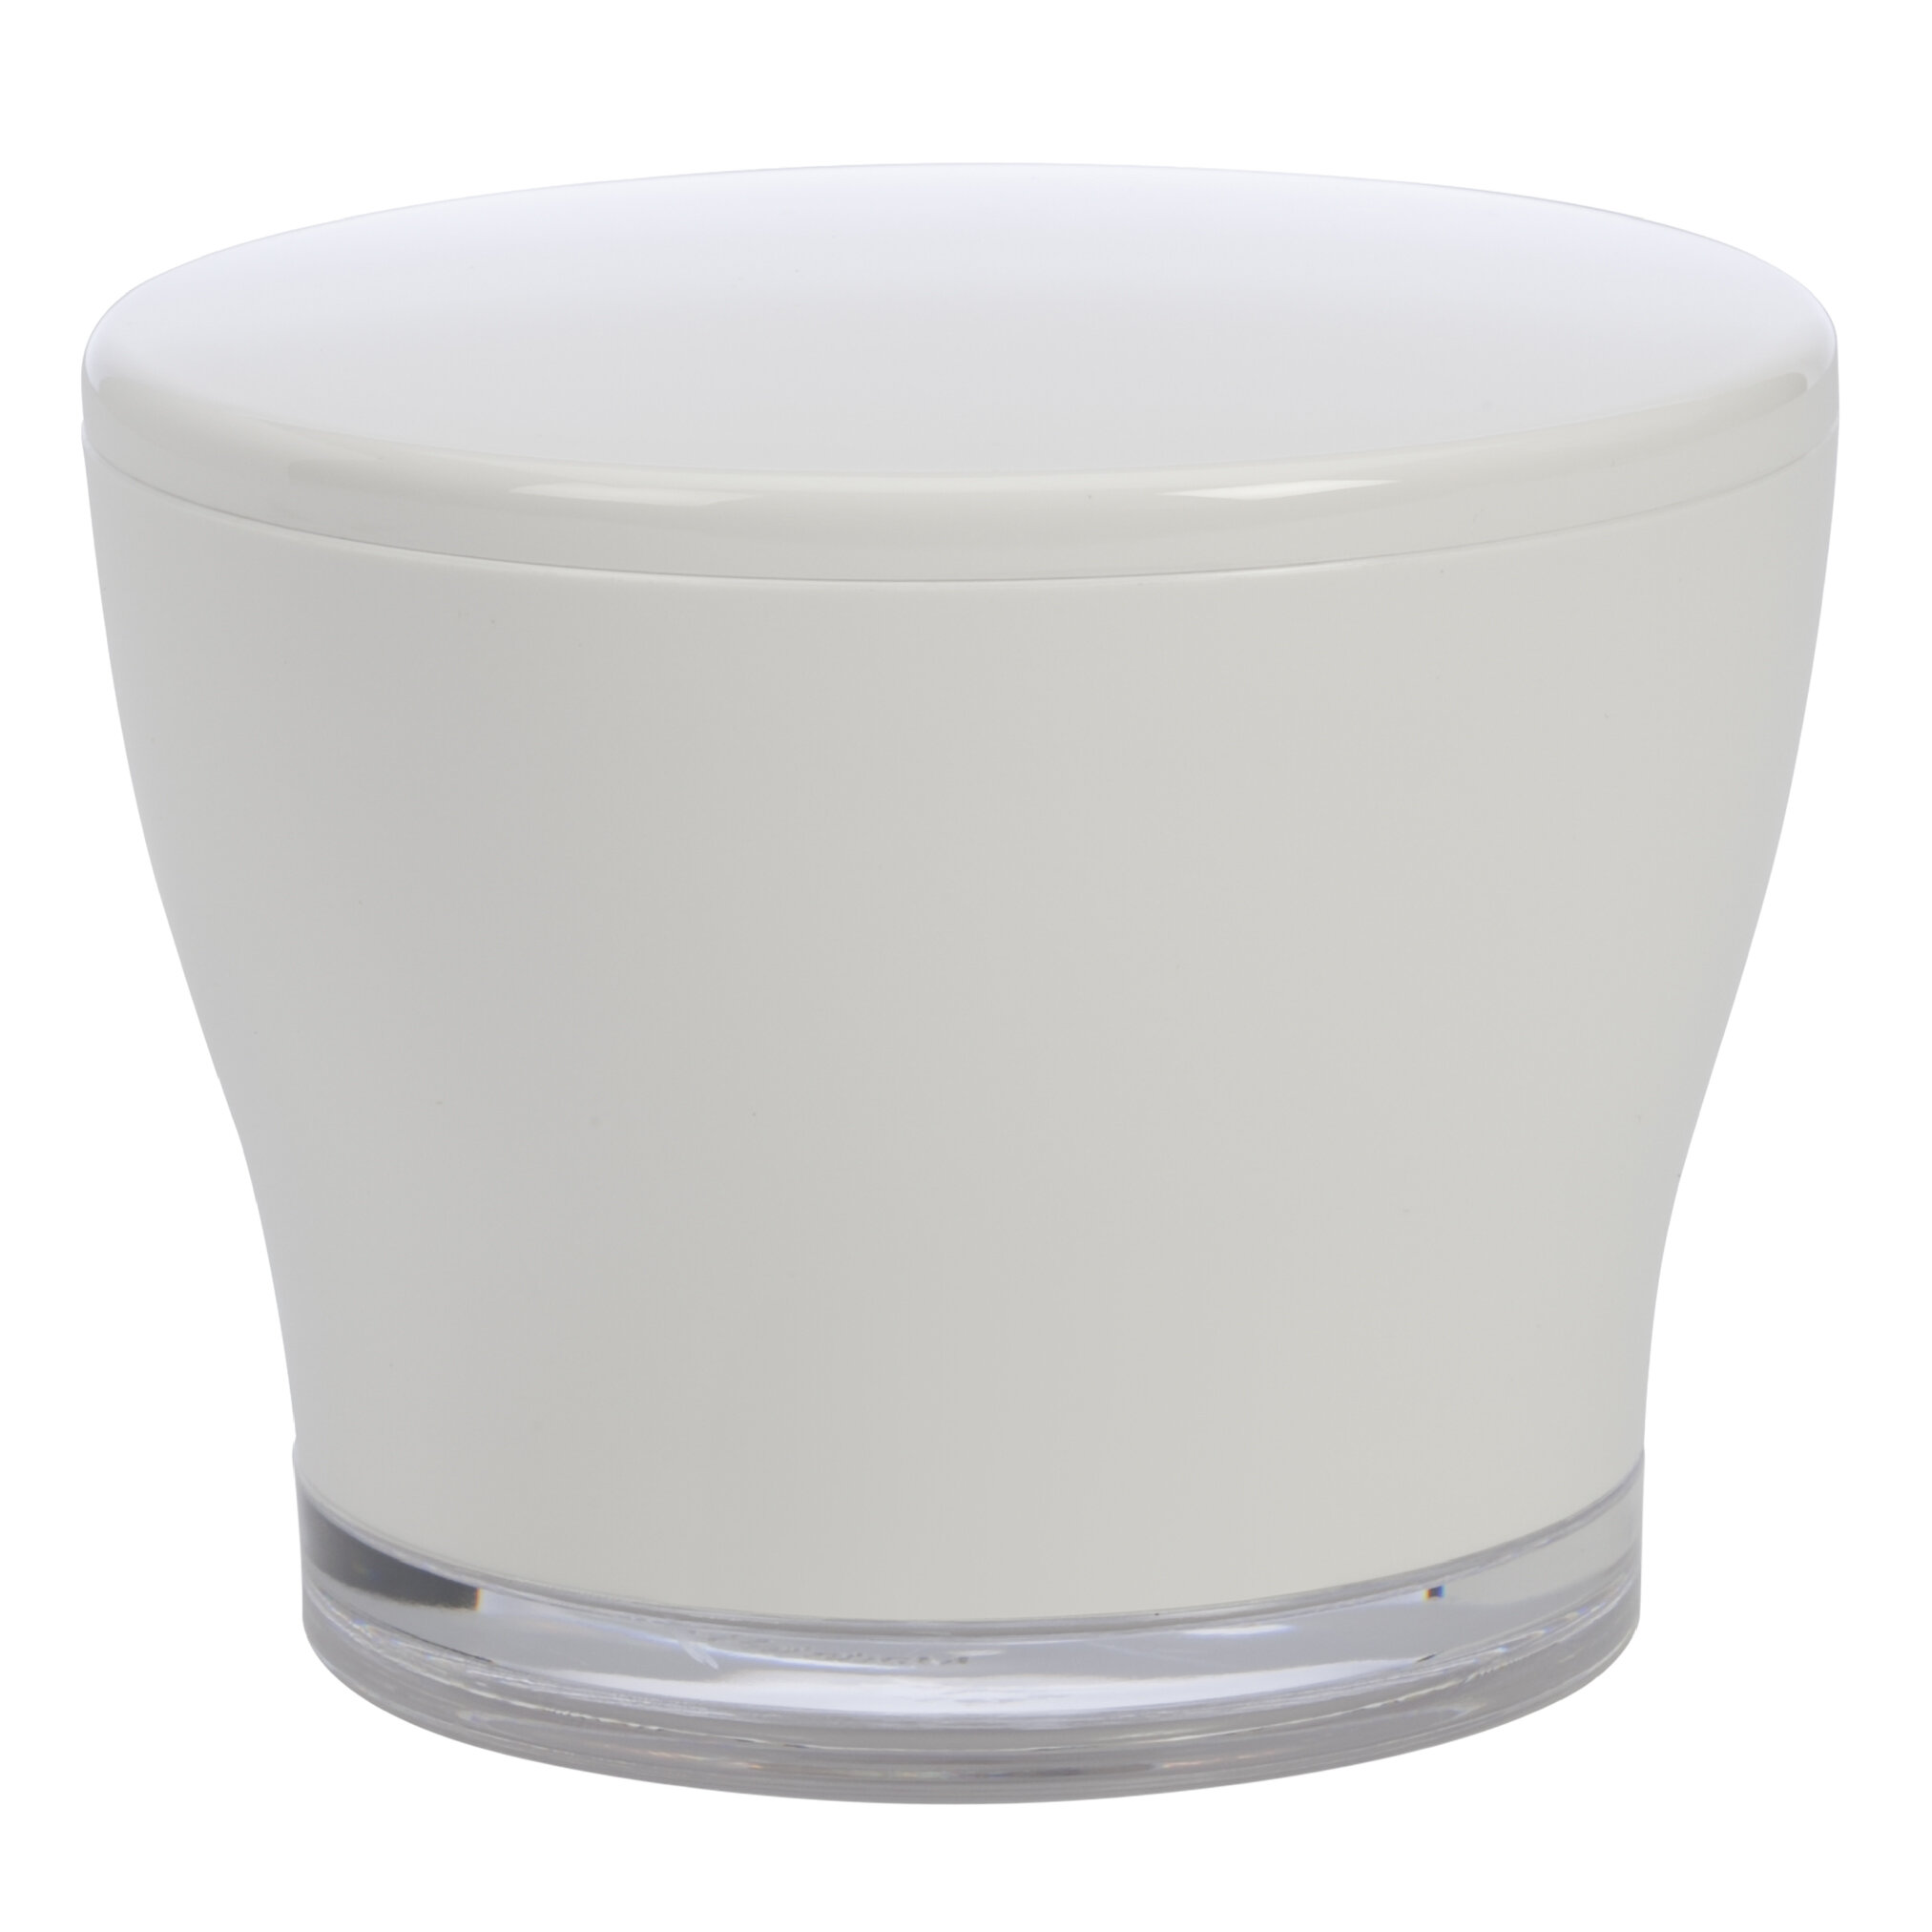 Plastic Winston Porter Countertop Bath Accessories You Ll Love In 2021 Wayfair